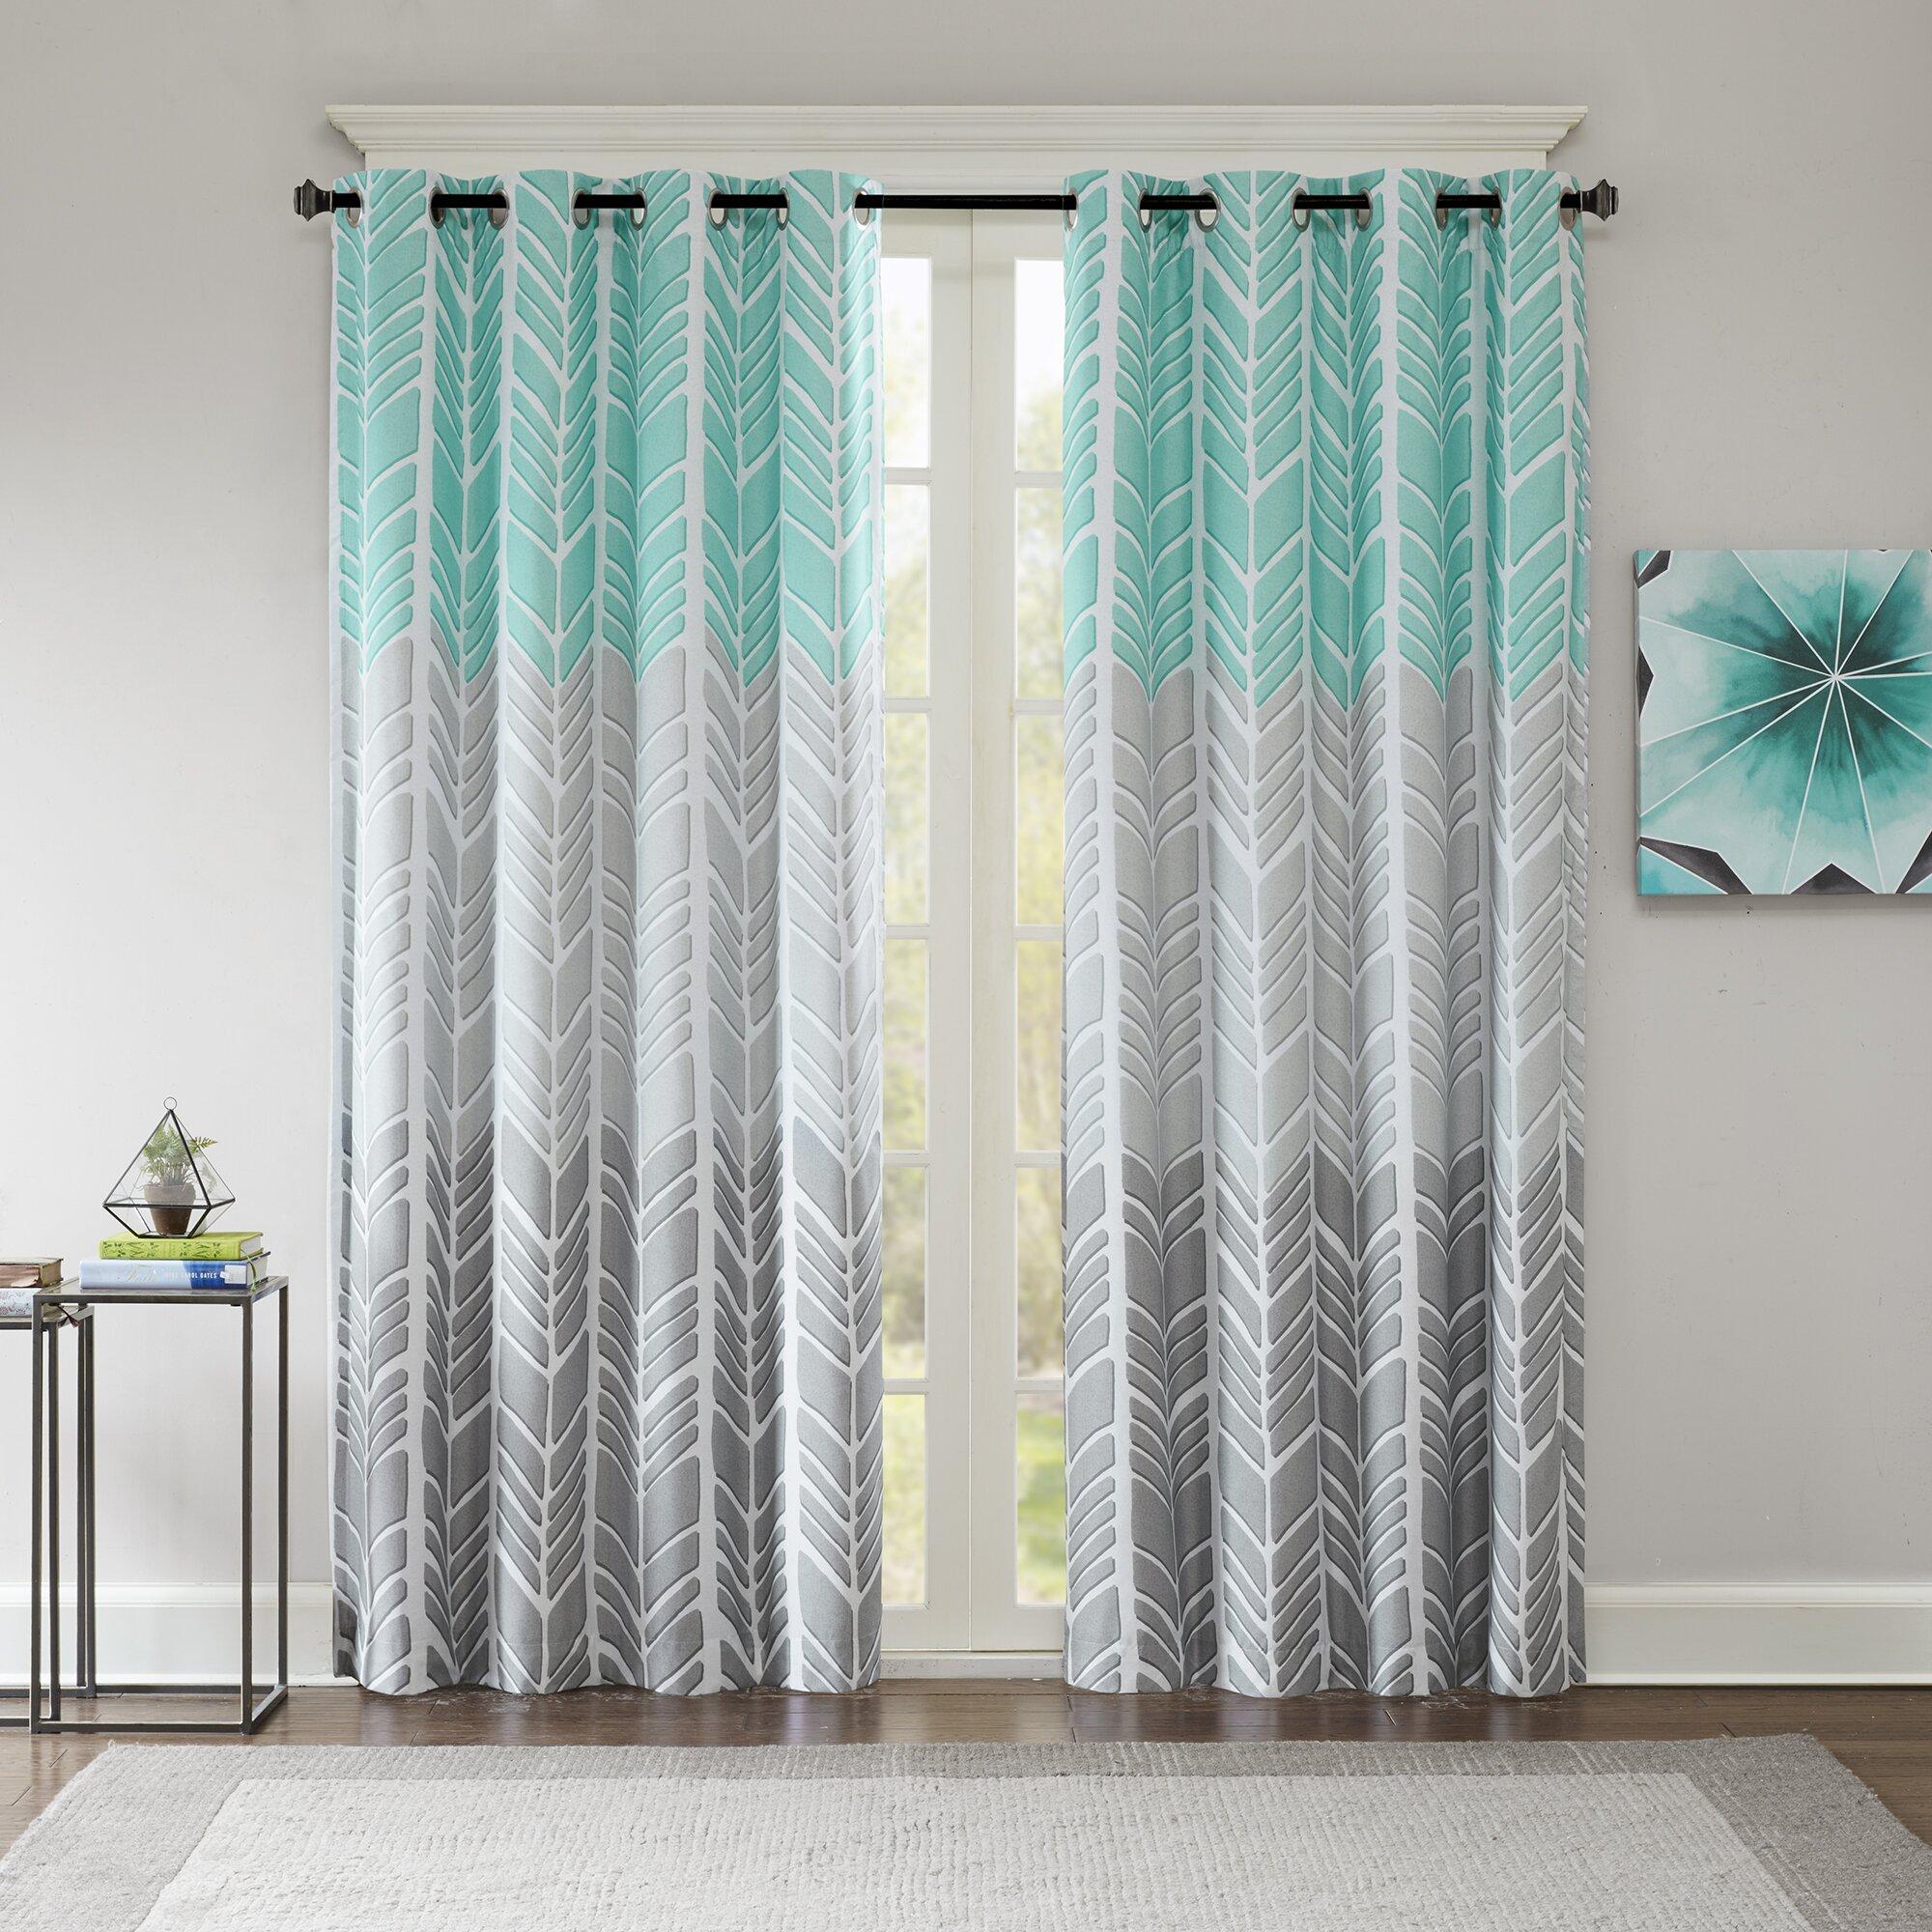 Beaded door curtains argos - Teal Curtain Beads Beaded Door Curtains Argos Dark Teal Curtain Panels Adel Blackout Single Curtain